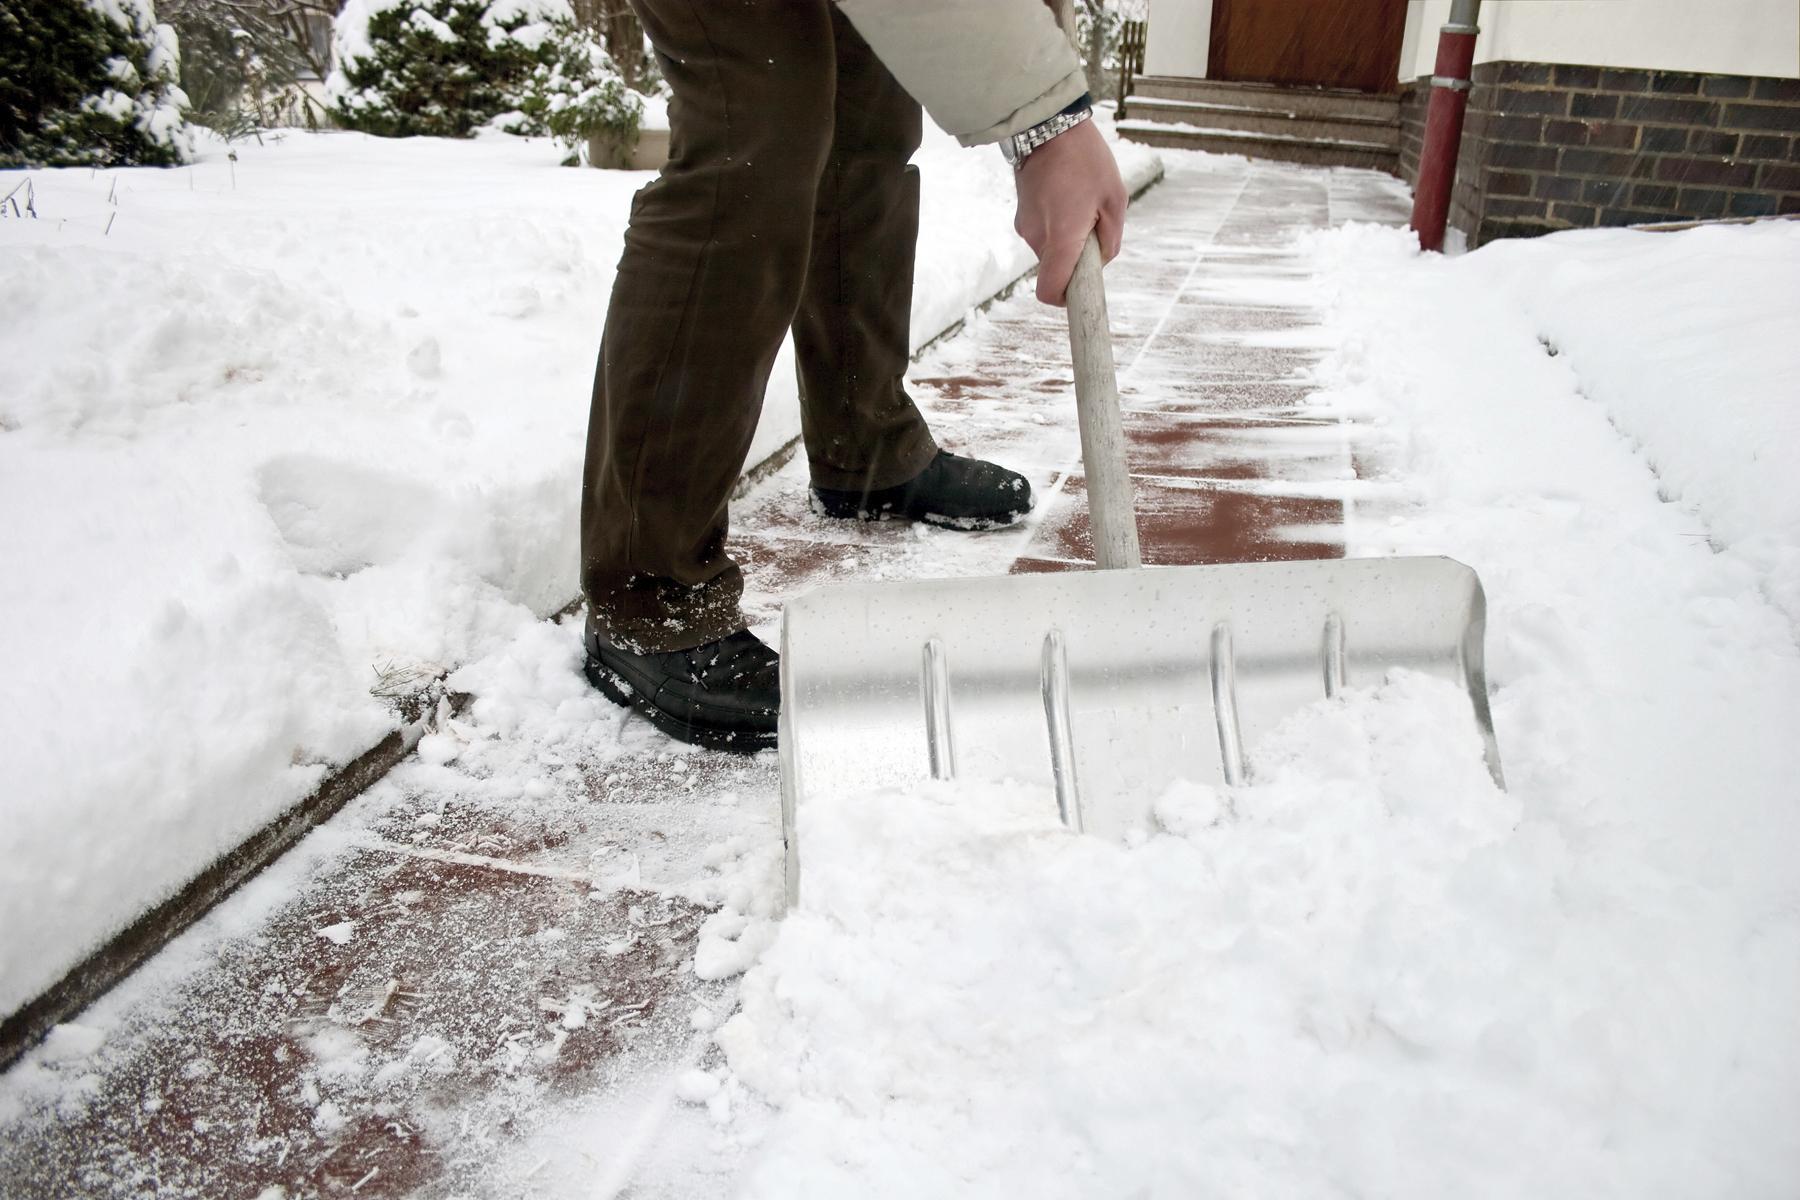 Бизнес-план: оказание услуг по уборке снега